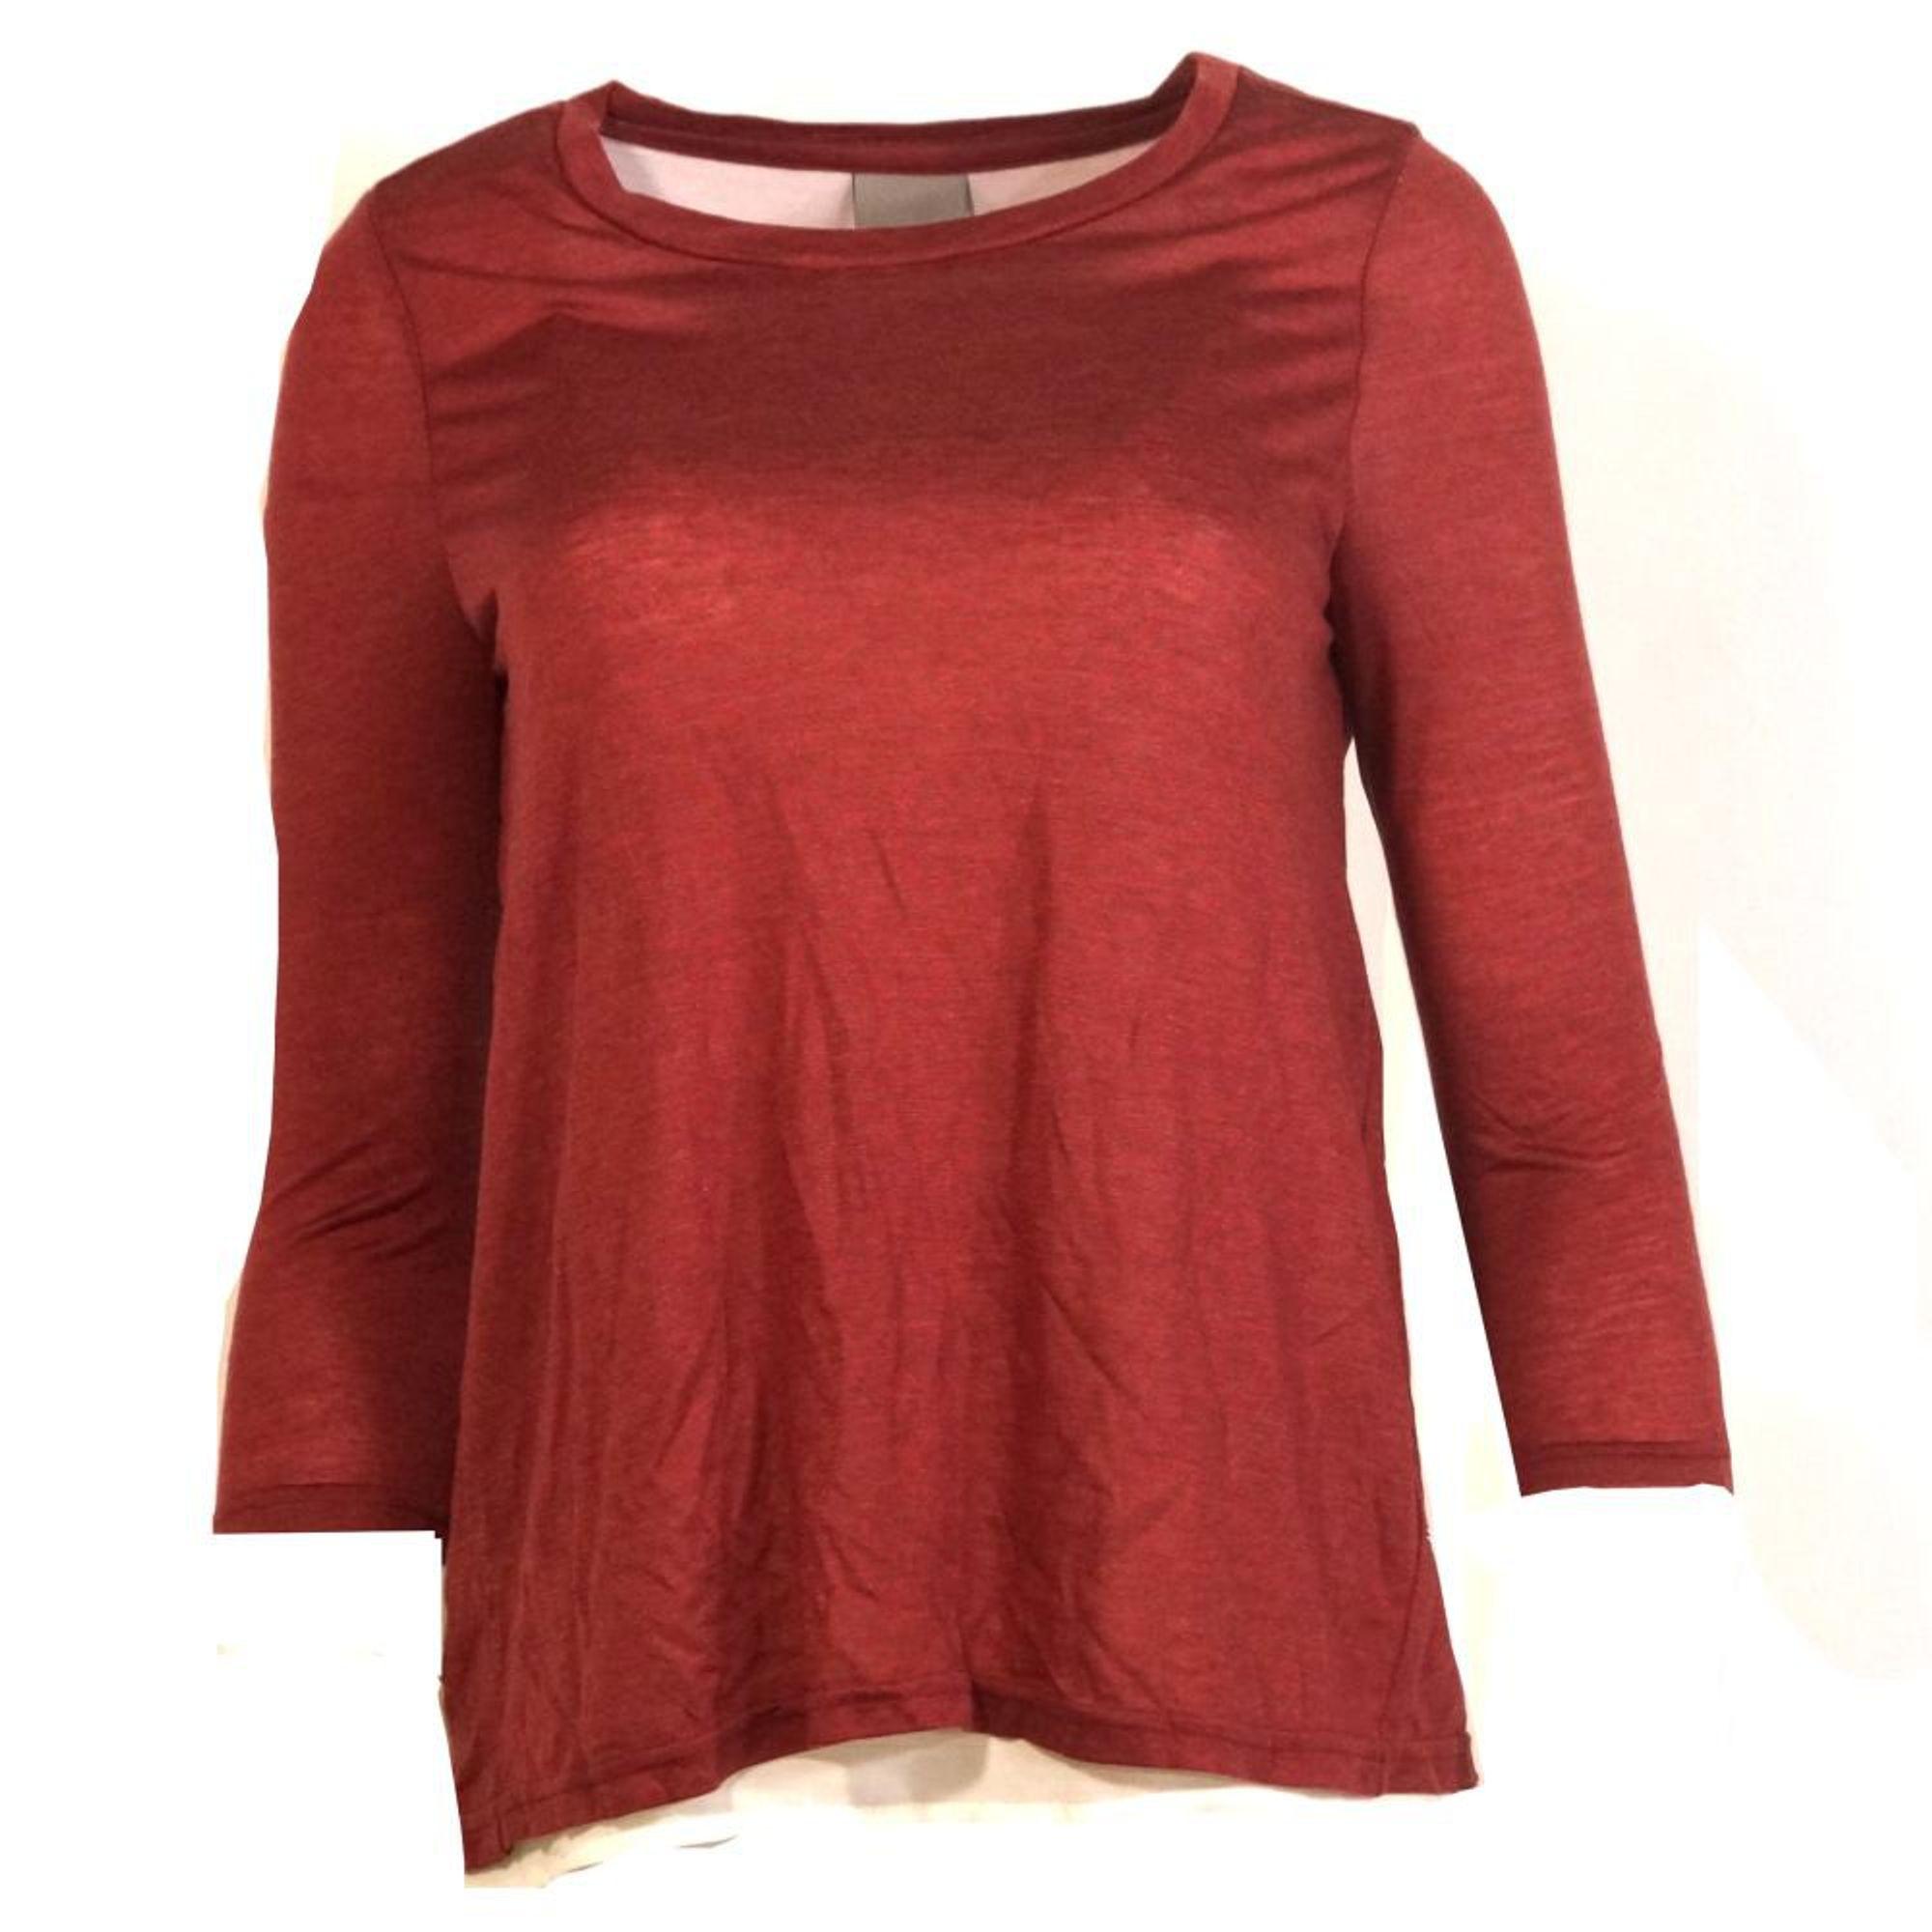 Vero Moda Damen Shirt Blusenshirt NEW MARIE 3/4 Top GA IT Rot Gr. XS